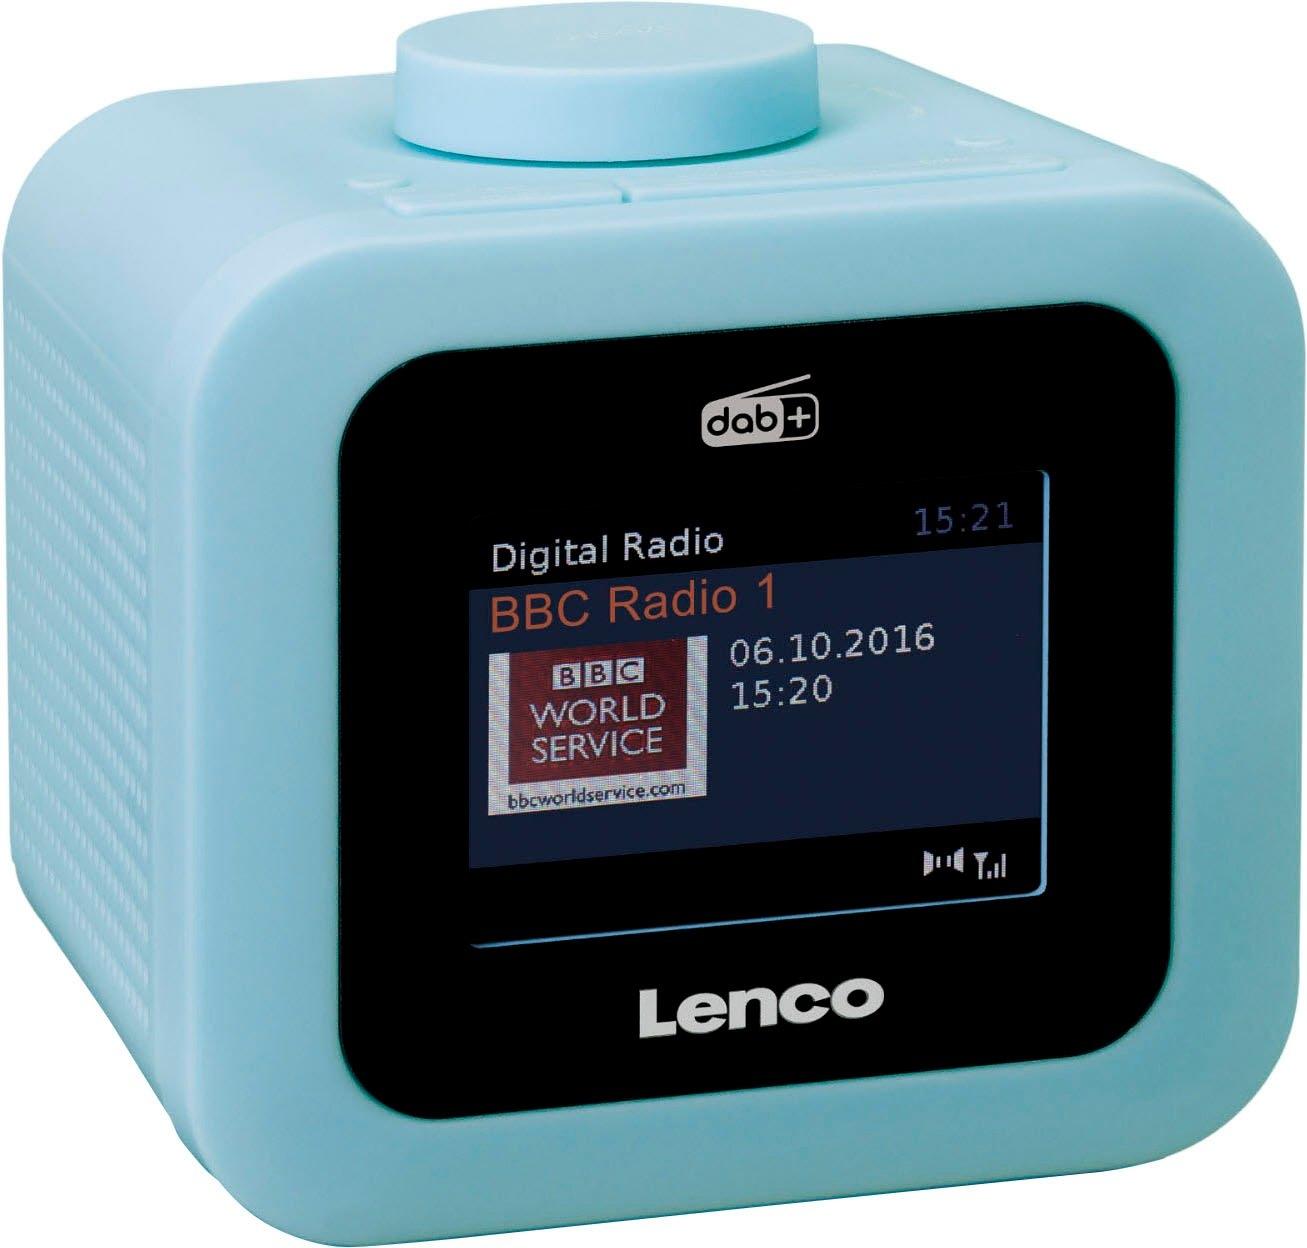 Lenco wekkerradio »CR-620 (Digitalradio (DAB+),FM-Tuner, 2 Watt) - gratis ruilen op otto.nl